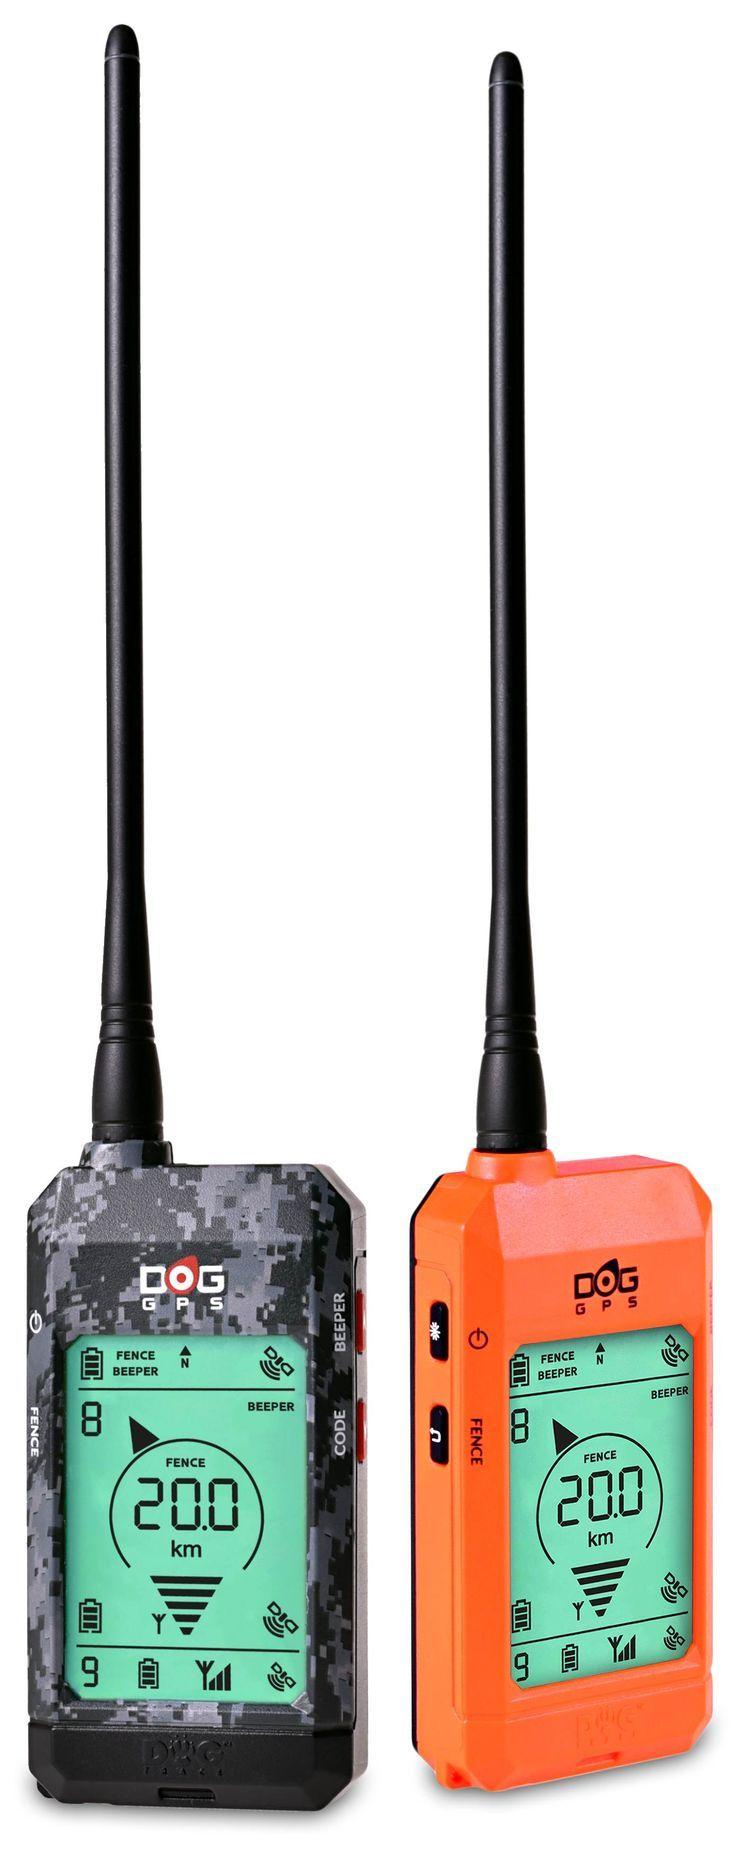 Dogtrace X20 Gps Collars Camo And Orange Collars Gps Dog Gps